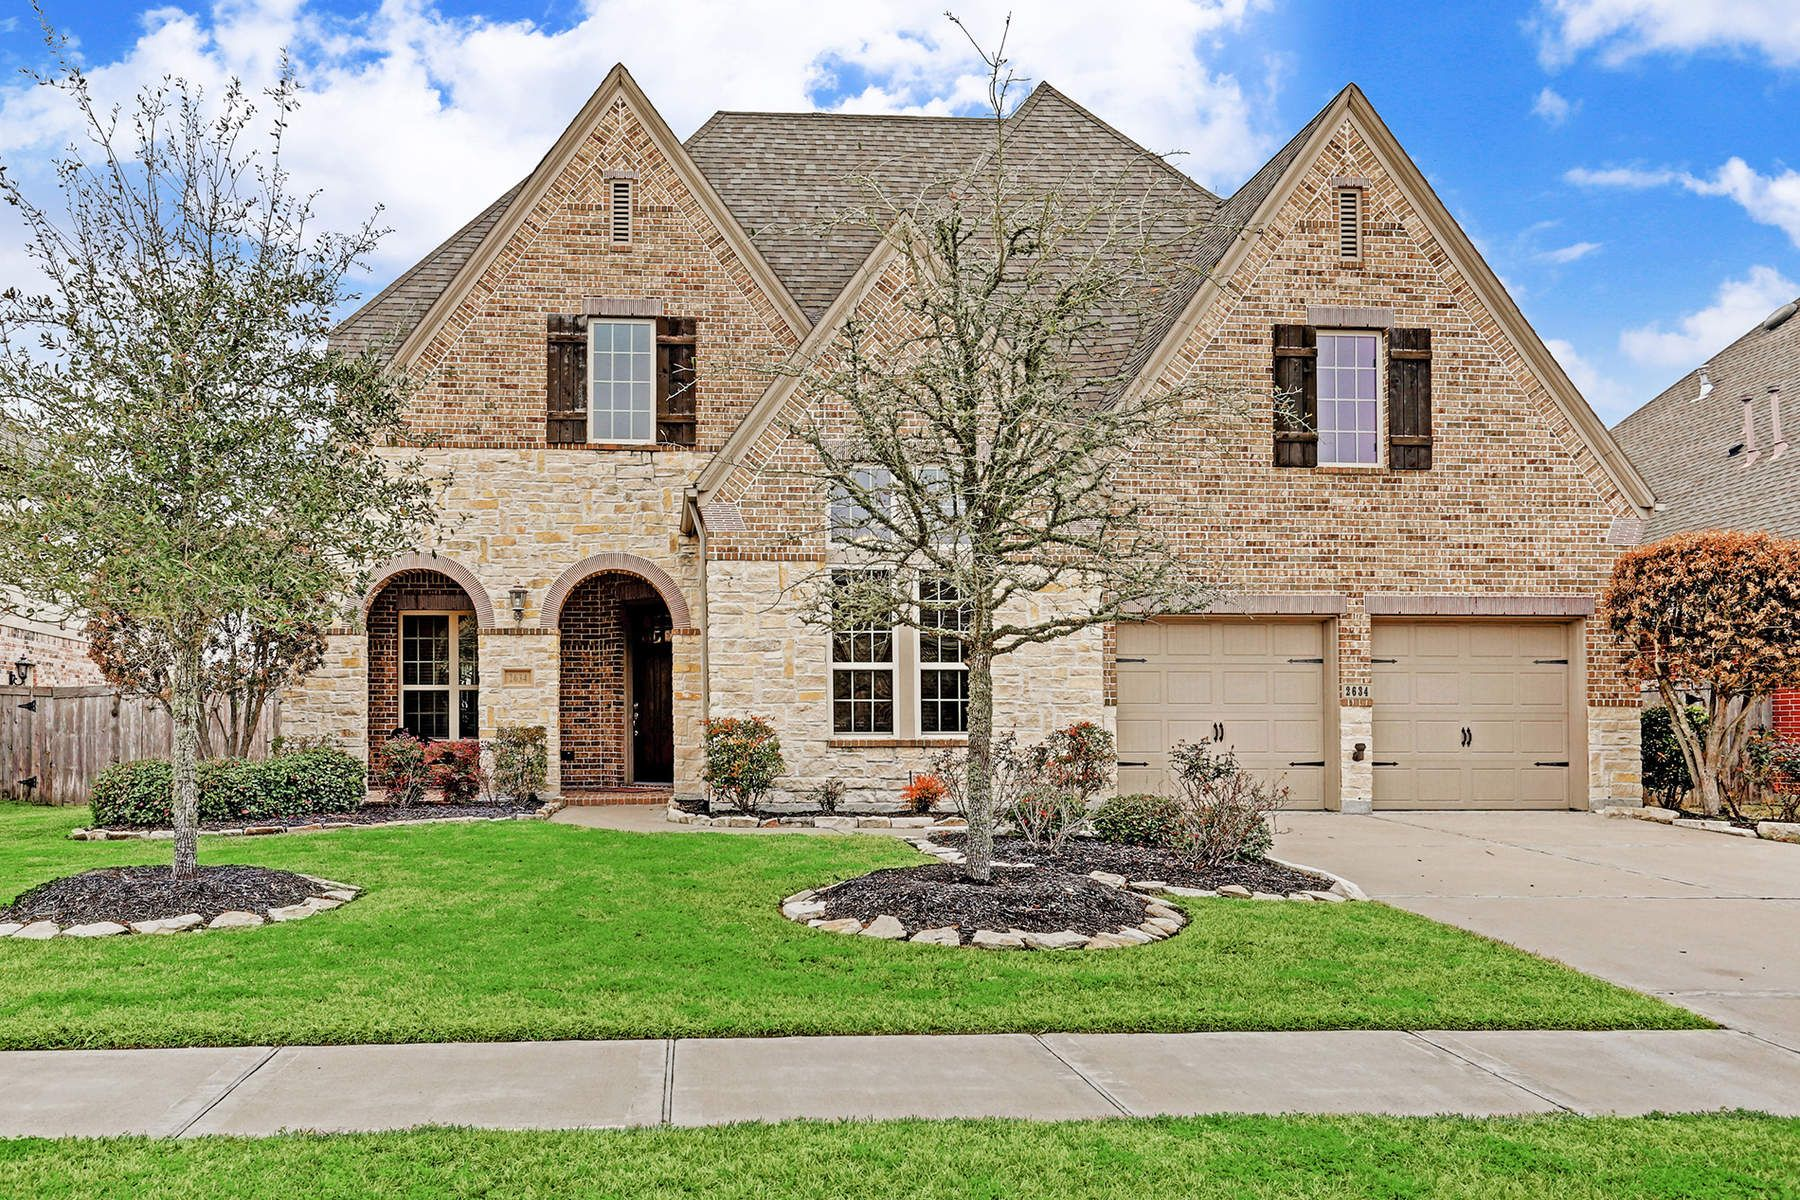 Single Family Home for Sale at 2634 Joshua Tree Lane 2634 Joshua Tree Lane Manvel, Texas 77578 United States